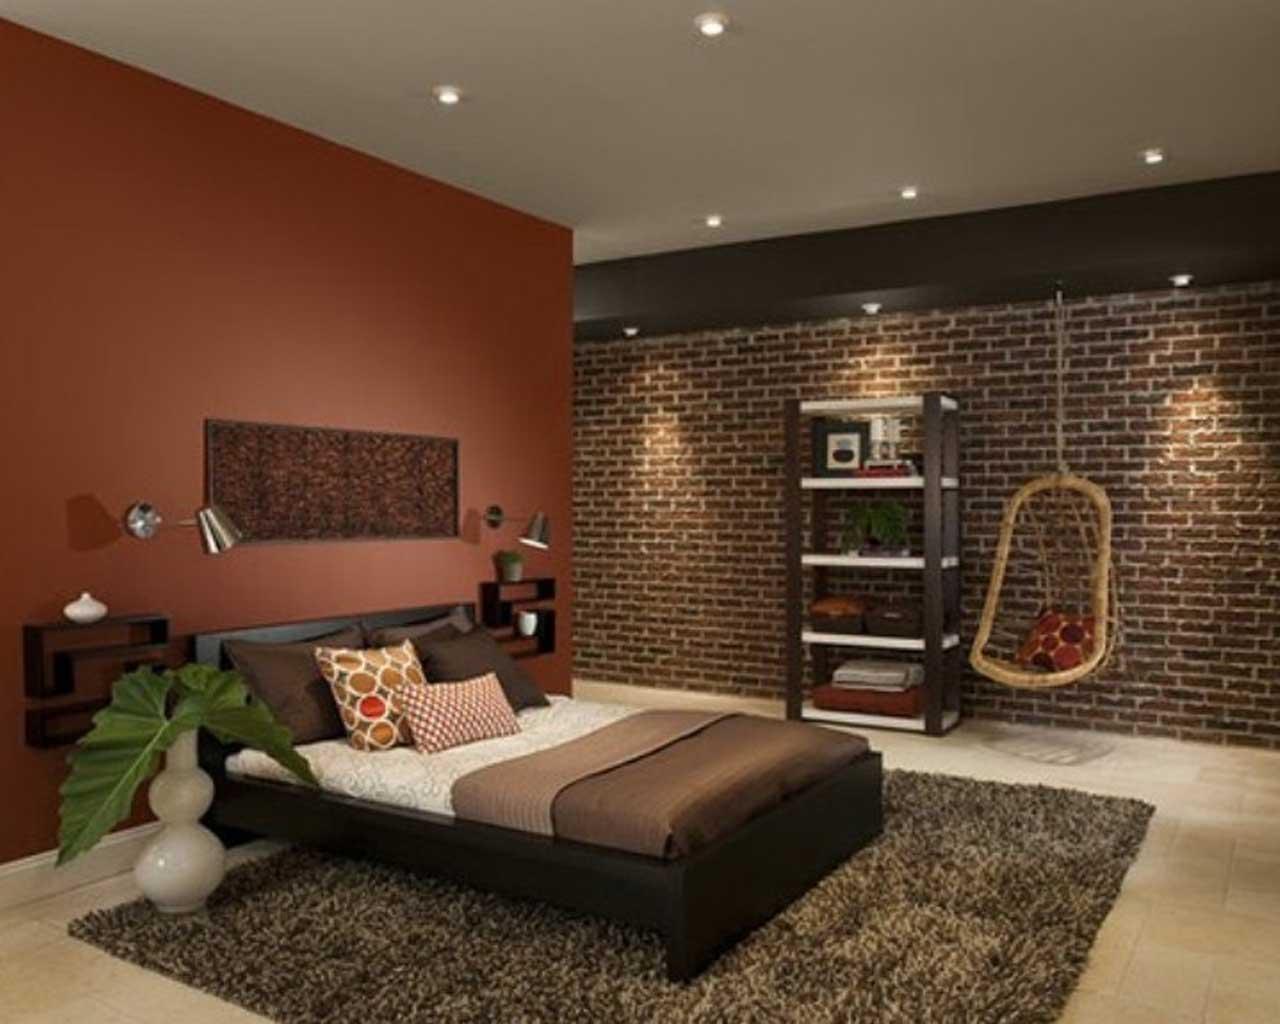 Chambre parentale design